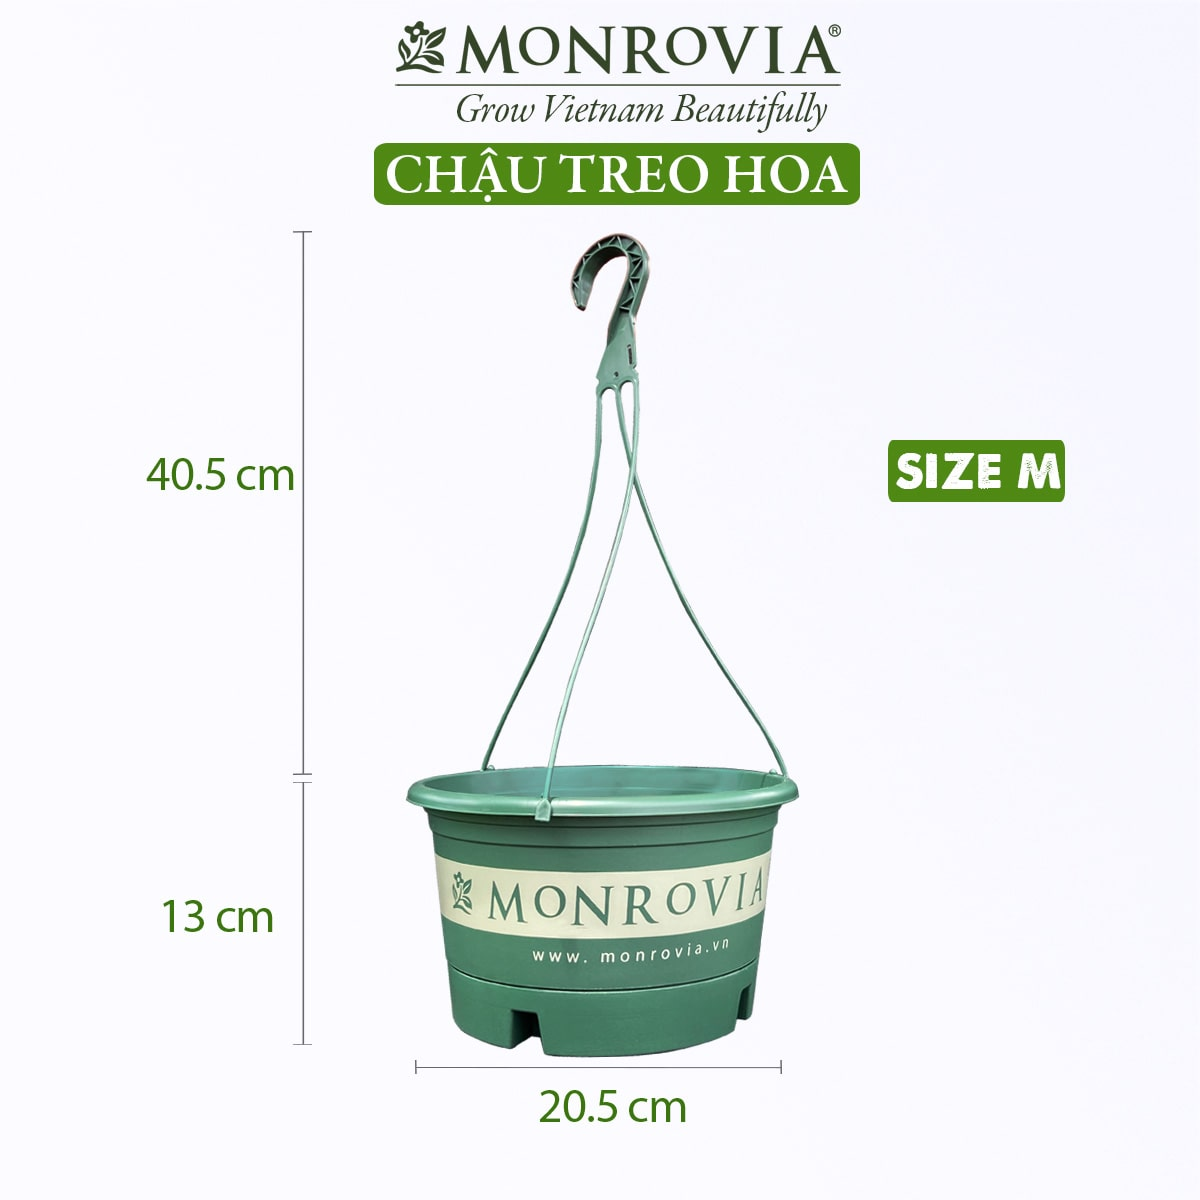 chau-treo-cay-monrovia-phong-cach-chau-au-sieu-thoat-nuoc